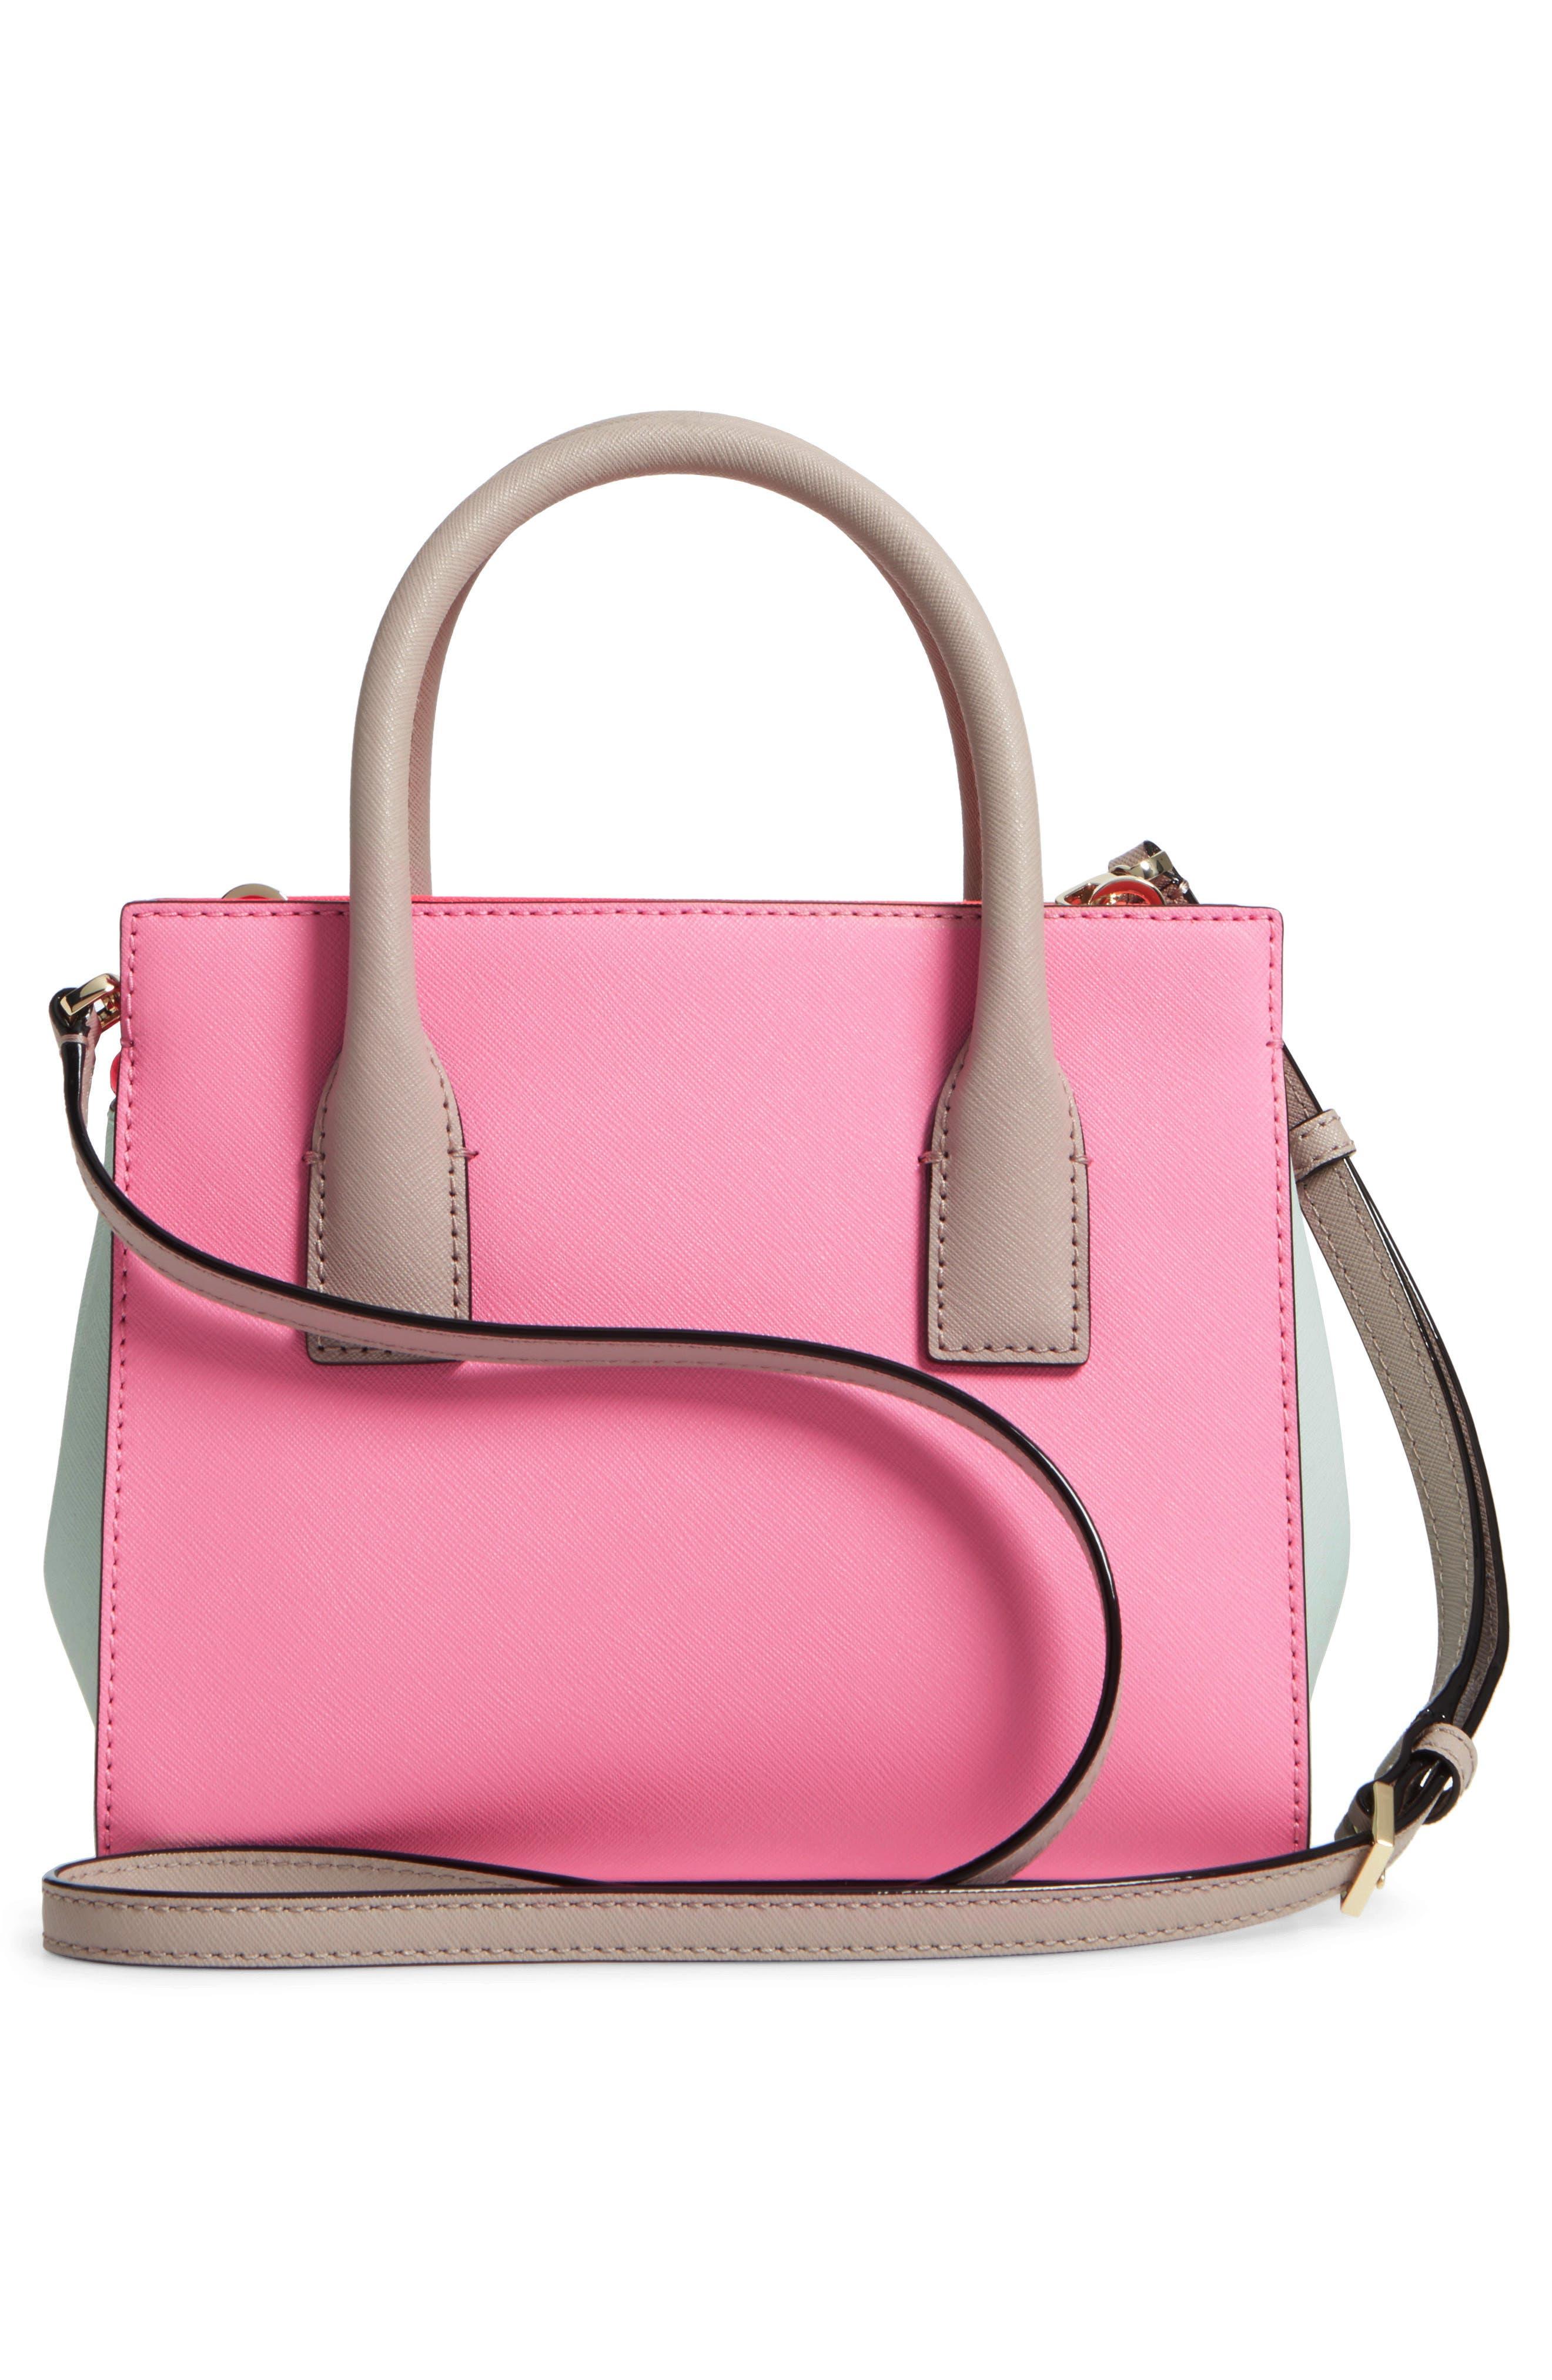 'cameron street - mini candace' leather satchel,                             Alternate thumbnail 3, color,                             690